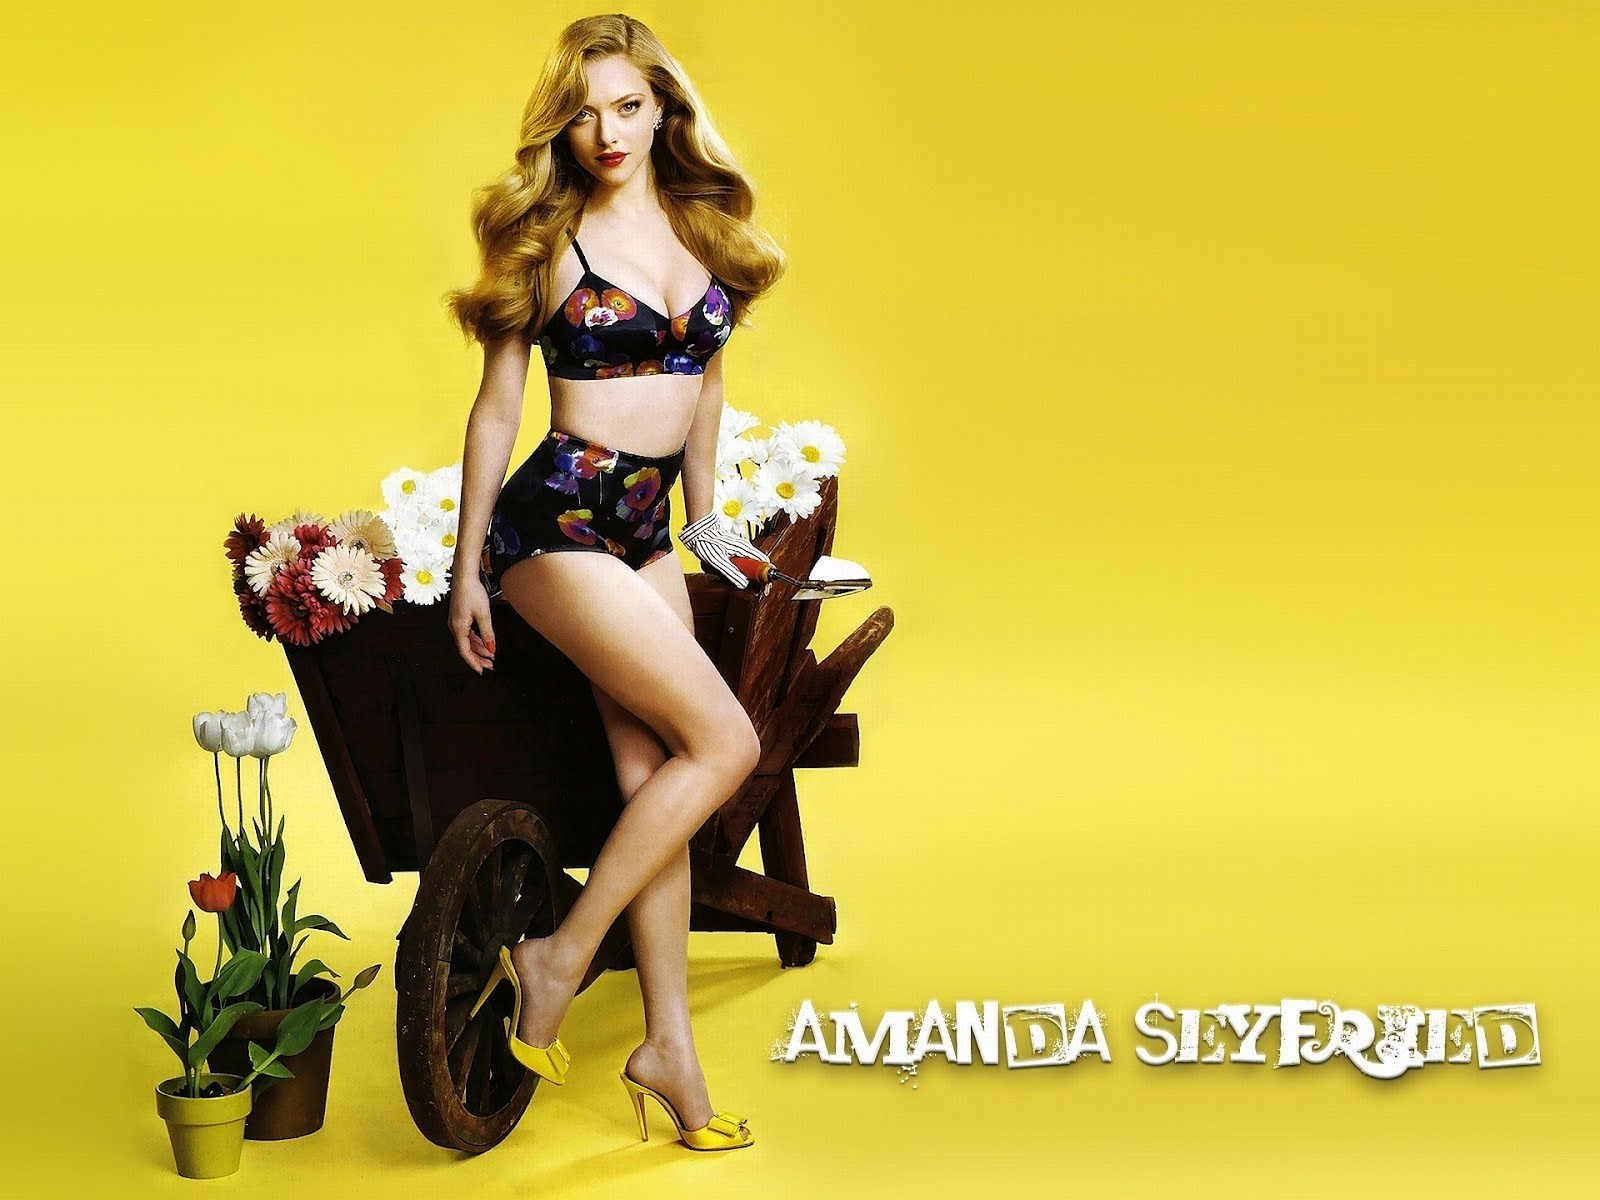 http://2.bp.blogspot.com/-LXChco6vT0E/T0zYGfbiaaI/AAAAAAAAAA4/dGE8Y2OIDSo/s1600/amanda-seyfried-hot-bikini-blonde-heels-wallpaper-hq-hd.jpg